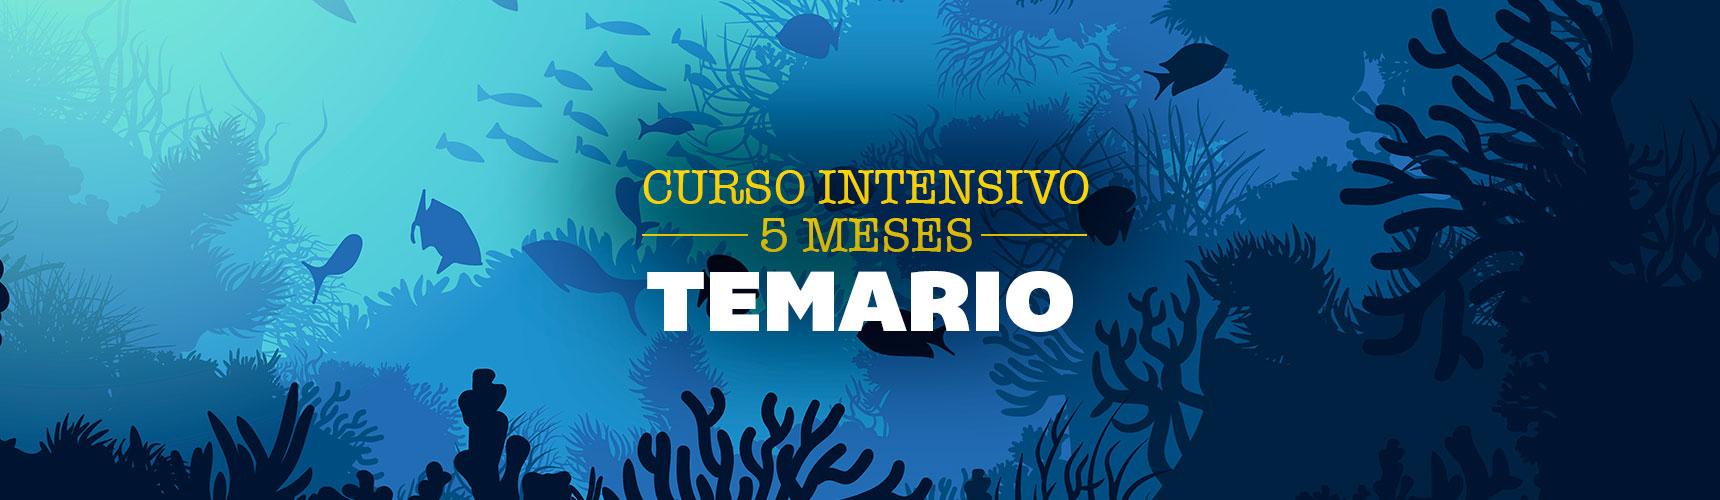 5meses_TEM_Pupitre_cursos_portada-web_nuevas-fotos_1720x910